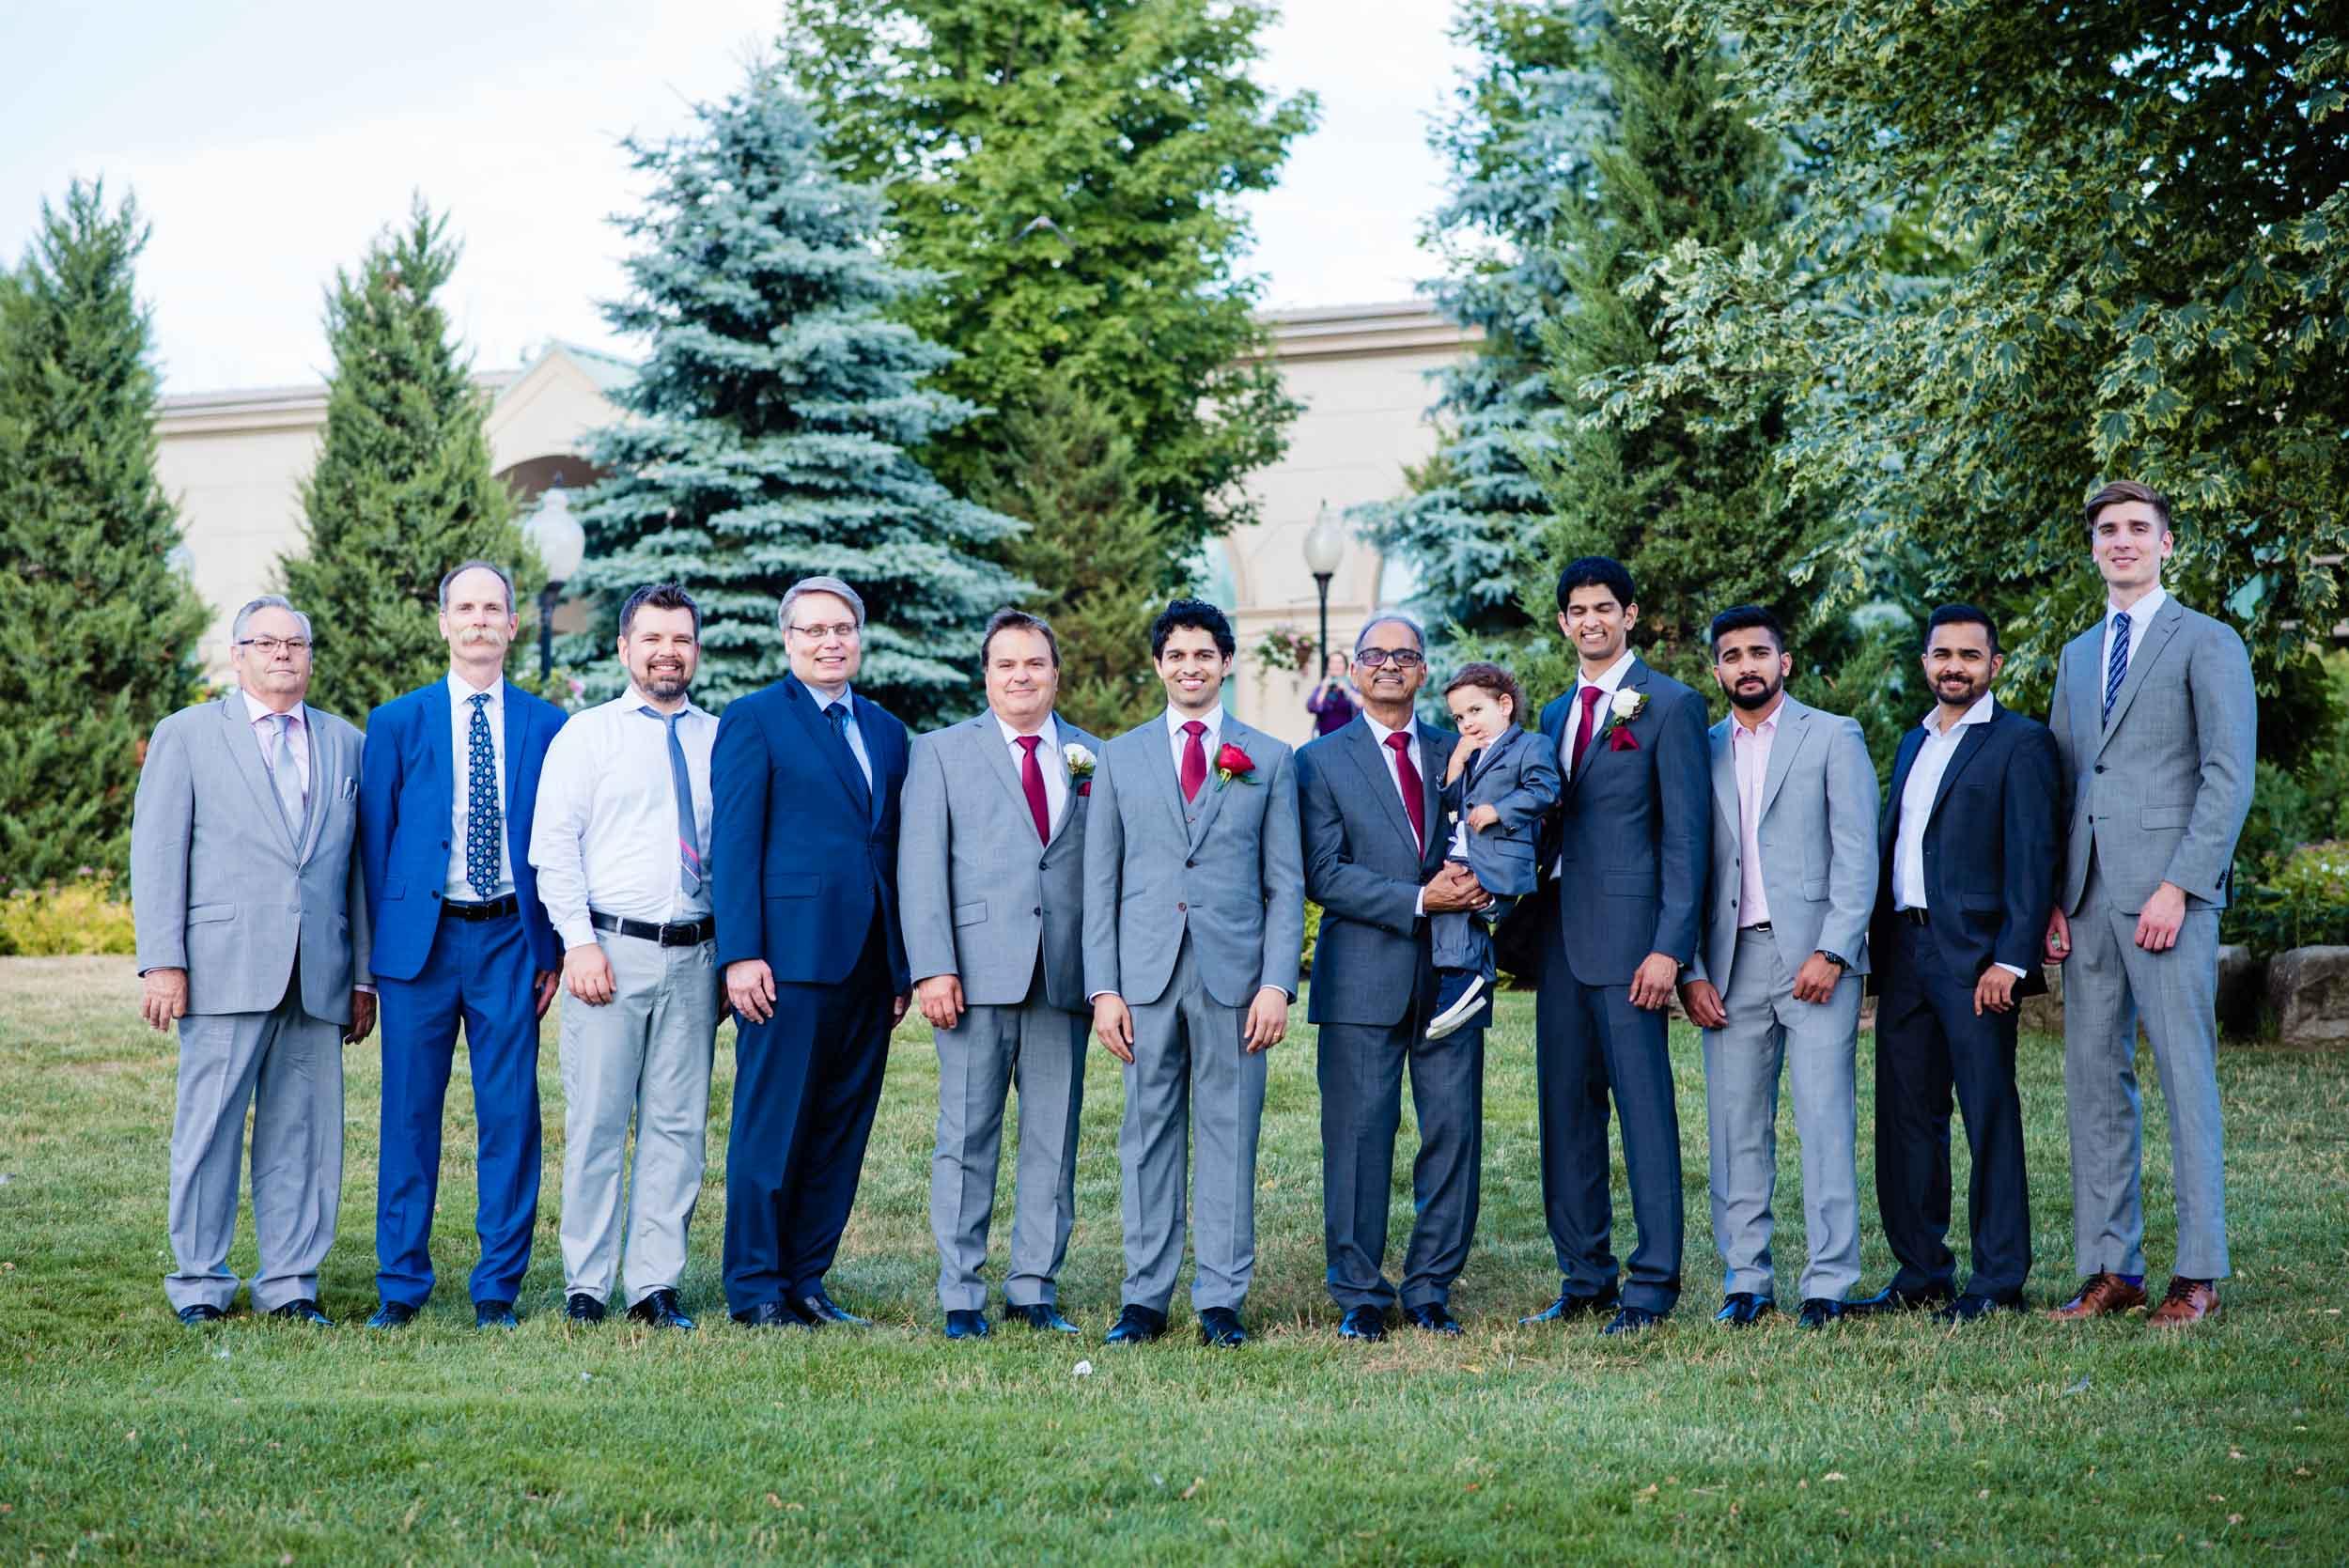 luxury-indian-wedding-royal-ambassador-toronto (67).jpg